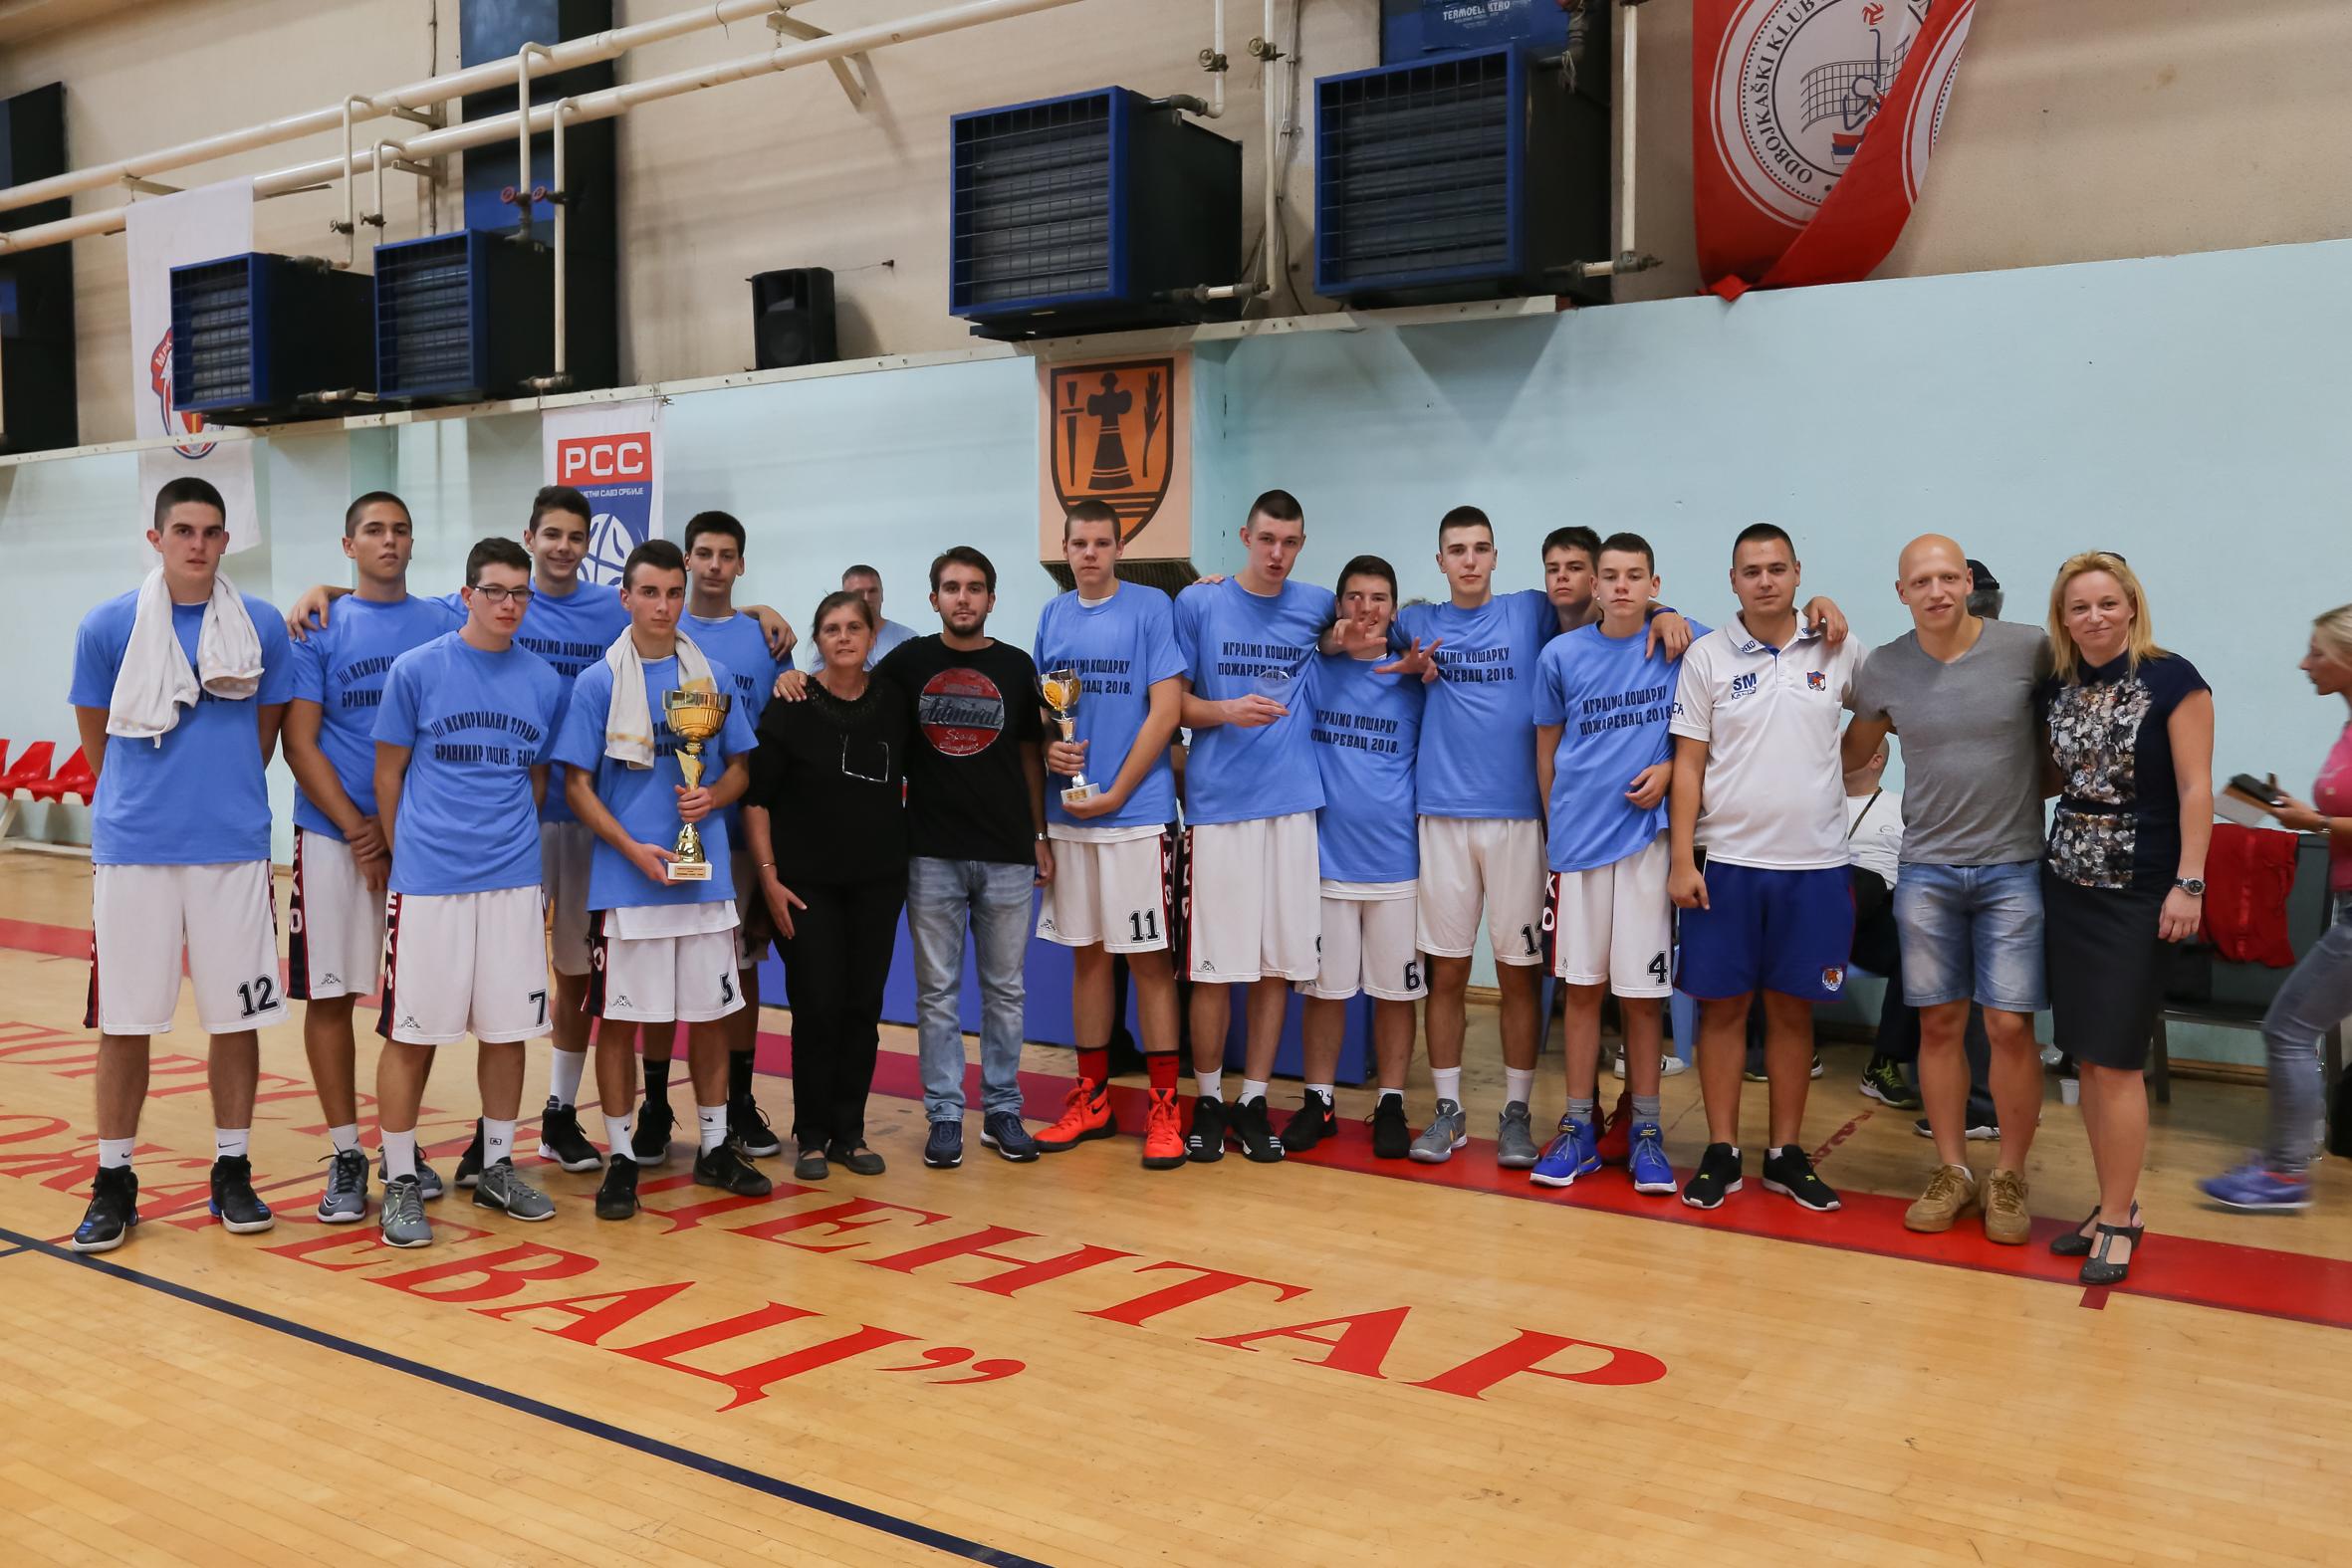 Memorijalni kadetski košarkaški turnir